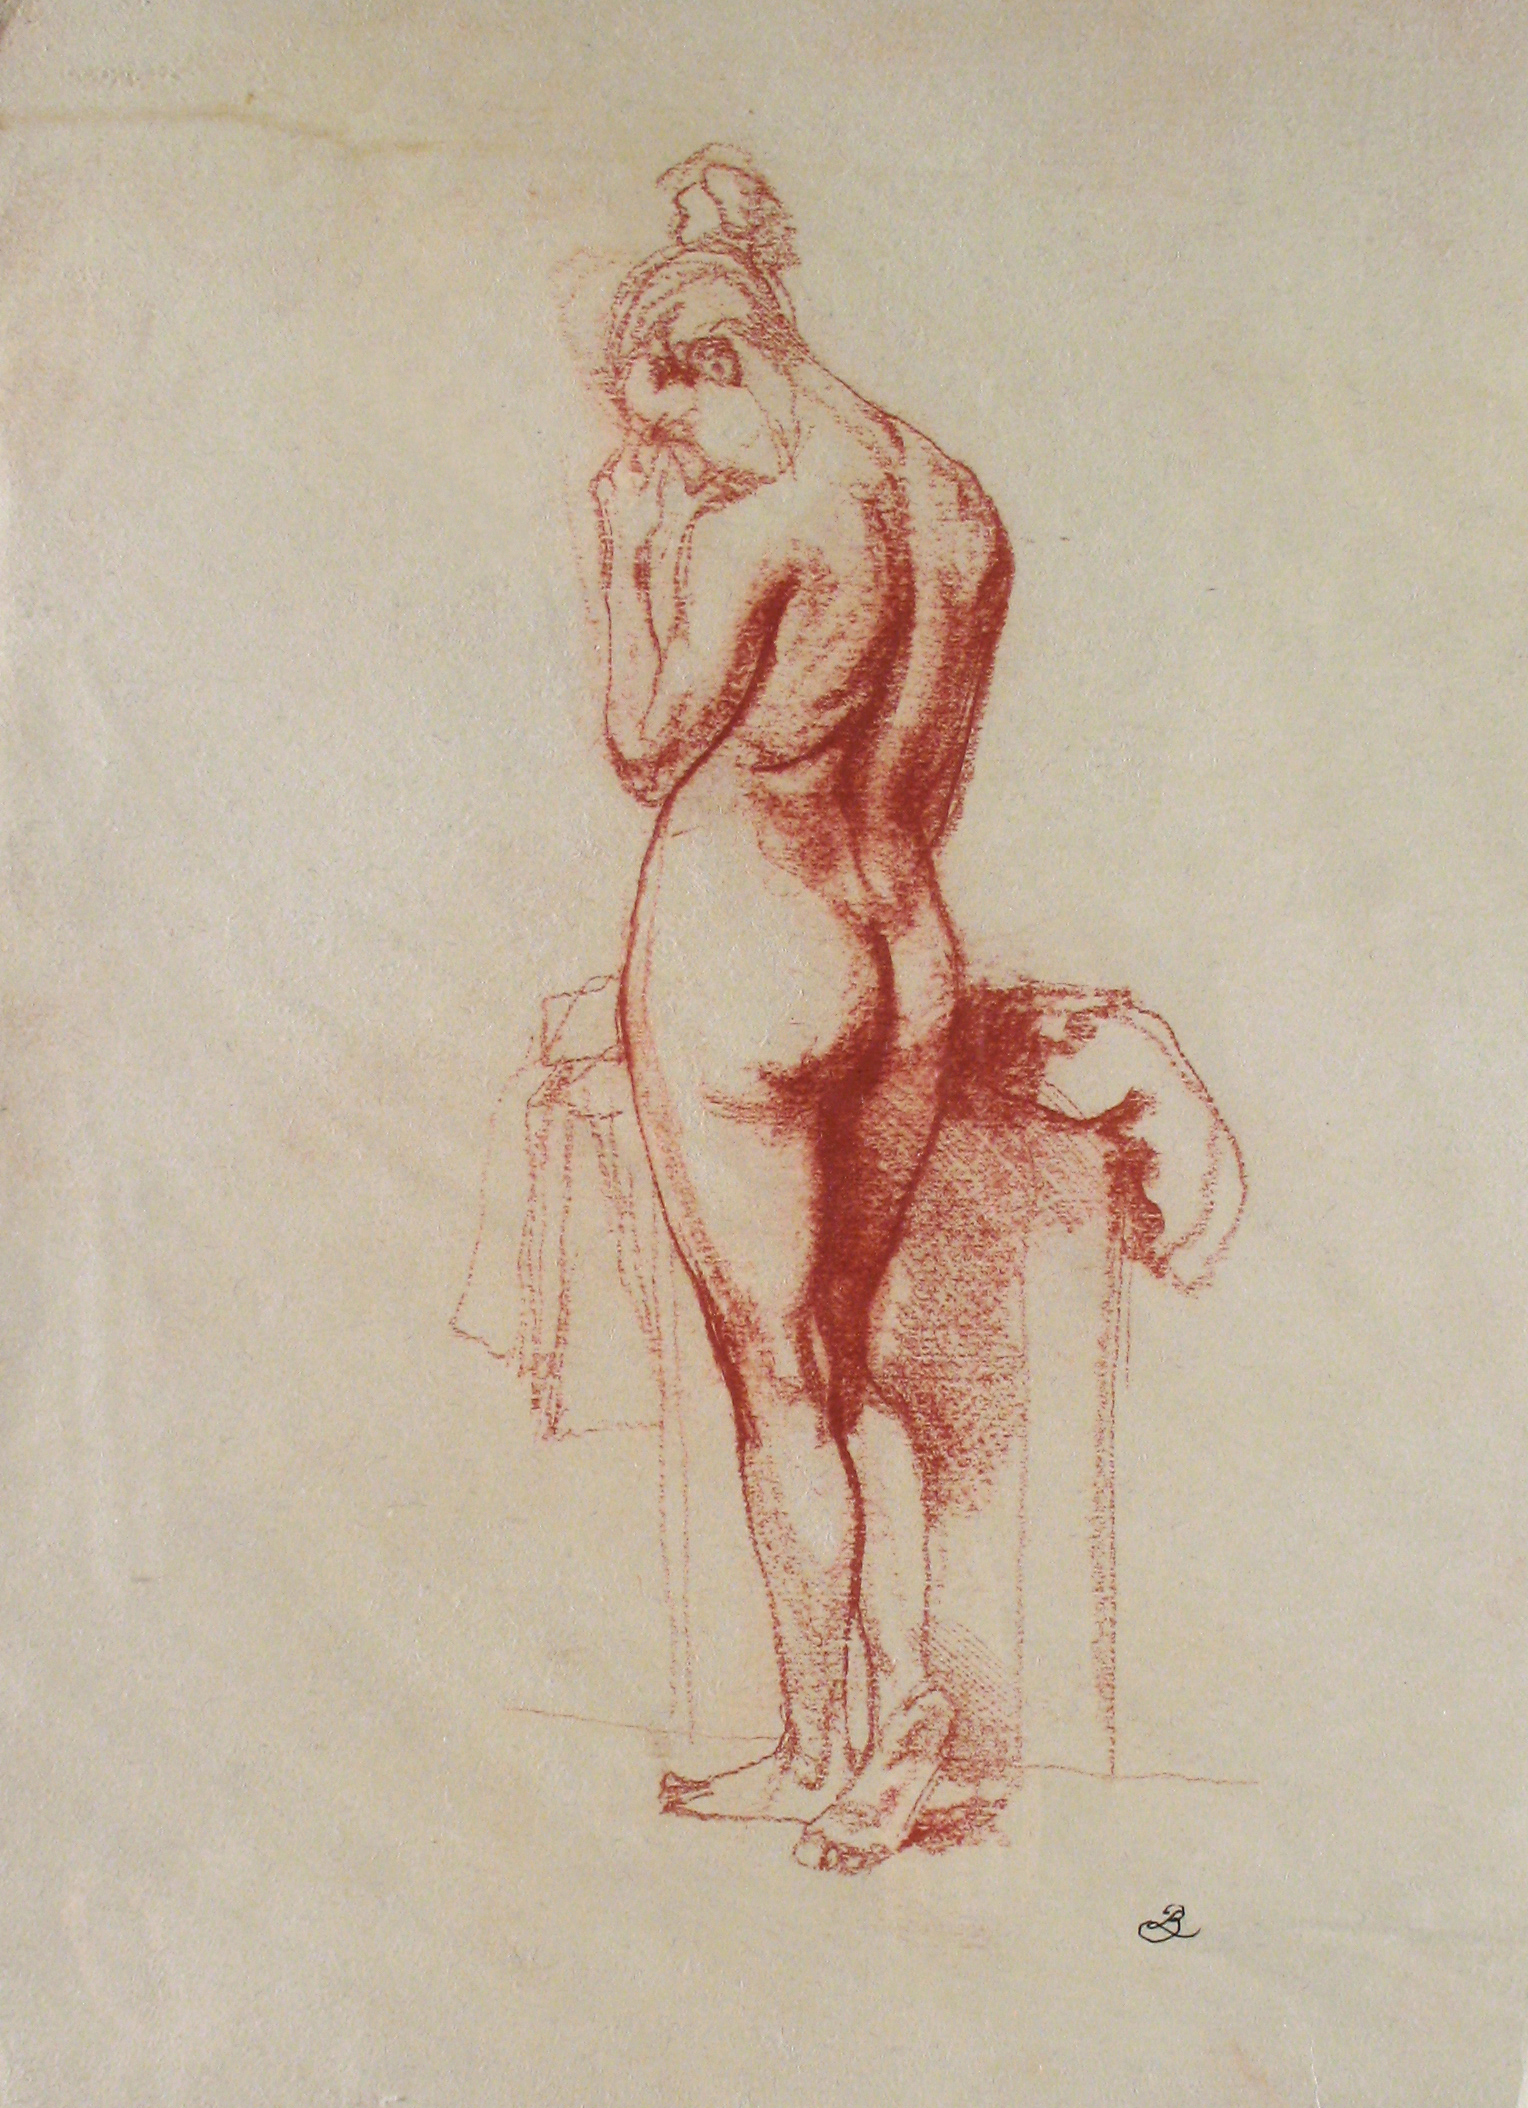 BL-DRA-nude1.jpg